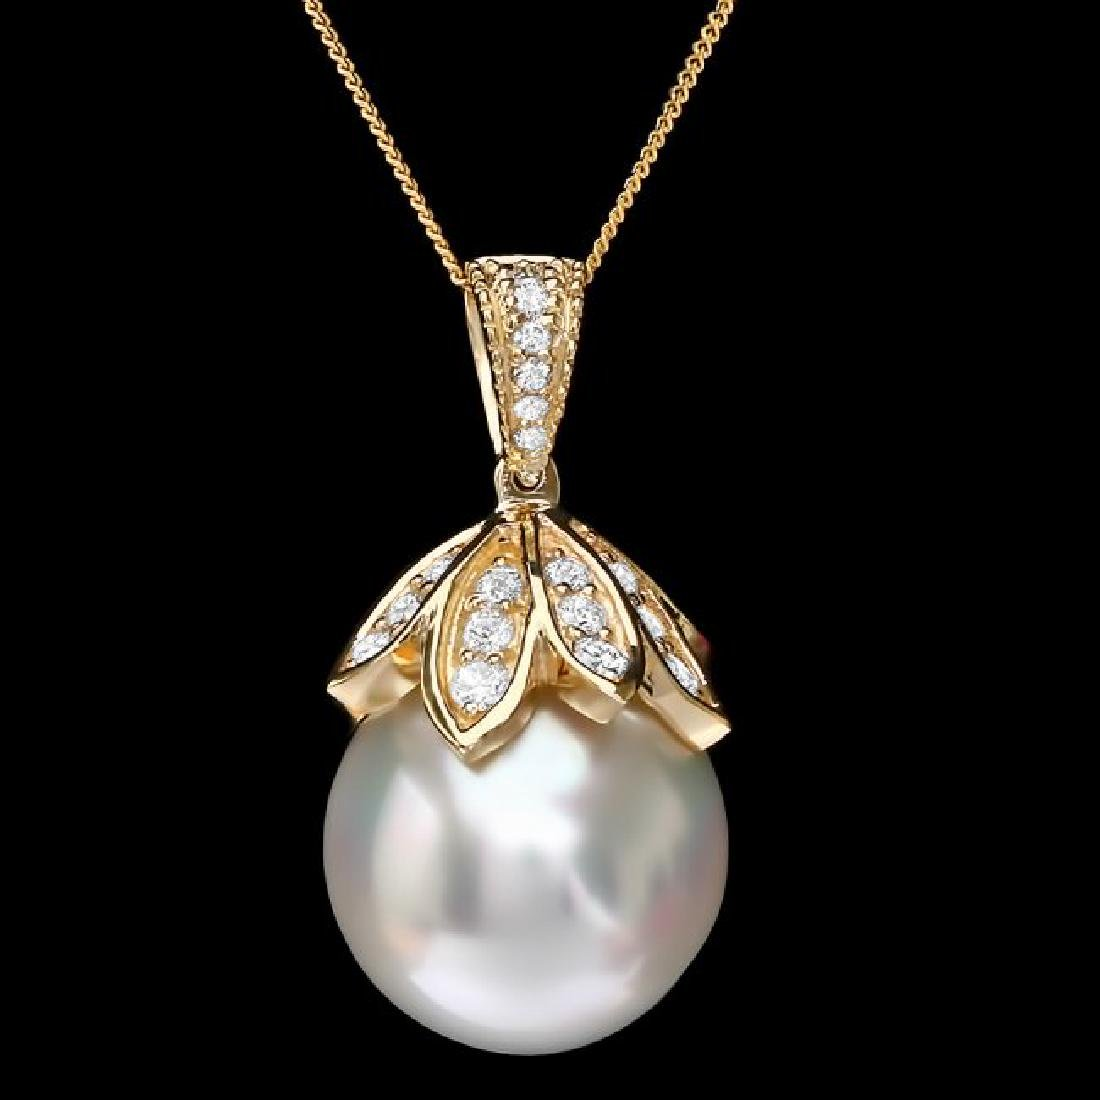 14k Gold 16 X 16mm Pearl 1.20ct Diamond Pendant